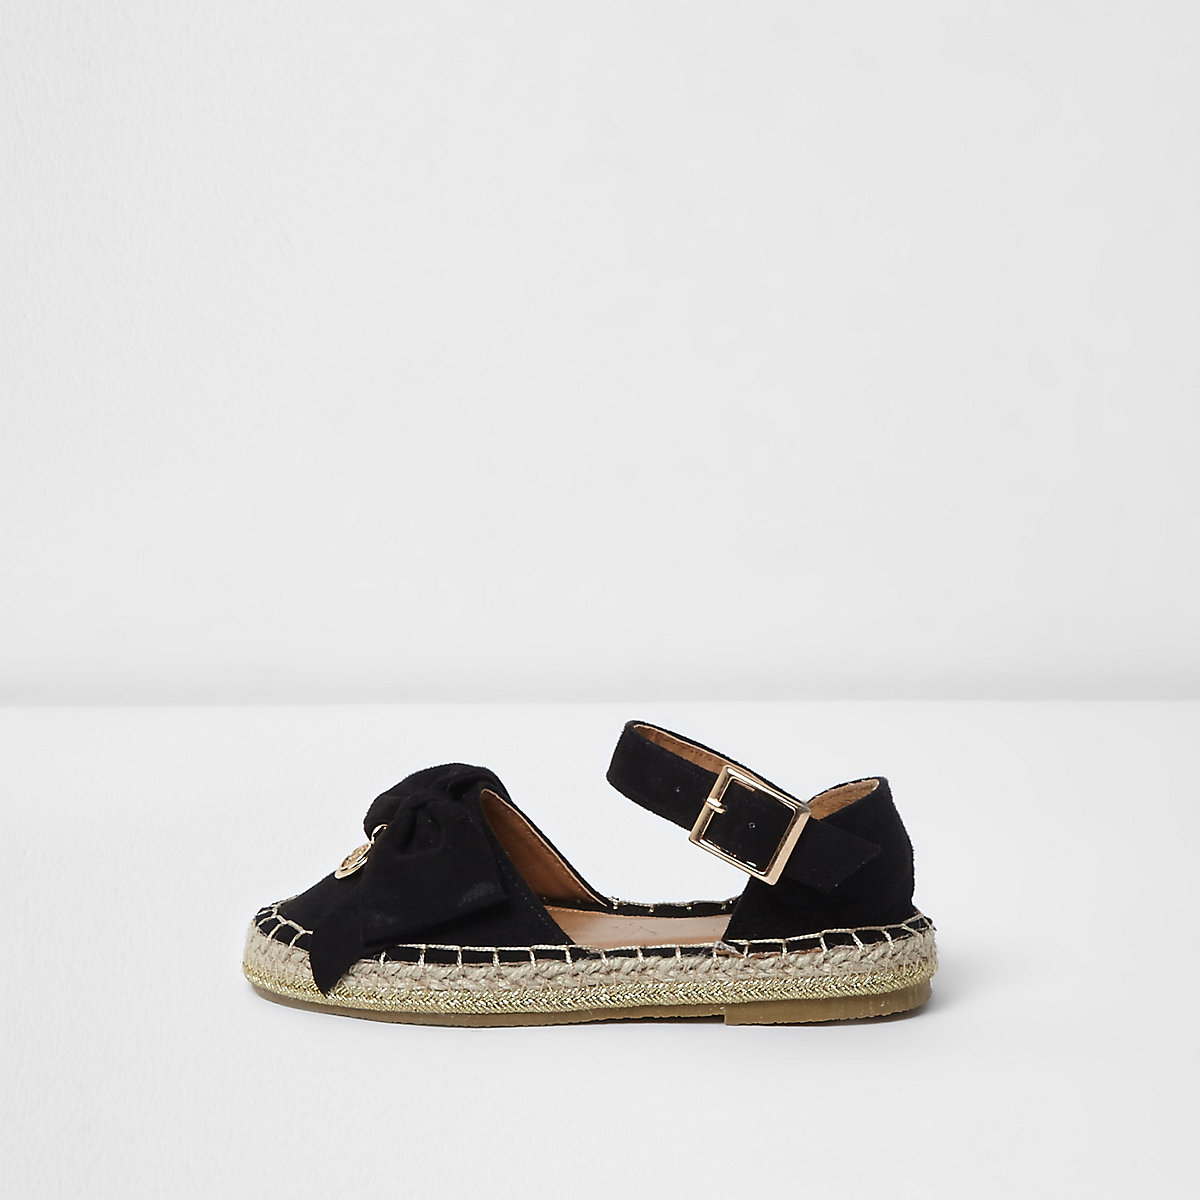 b96269d83429 Mini girls black bow top espadrille sandals - Baby Girls Sandals - Baby  Girls Shoes   Boots - Mini Girls - girls